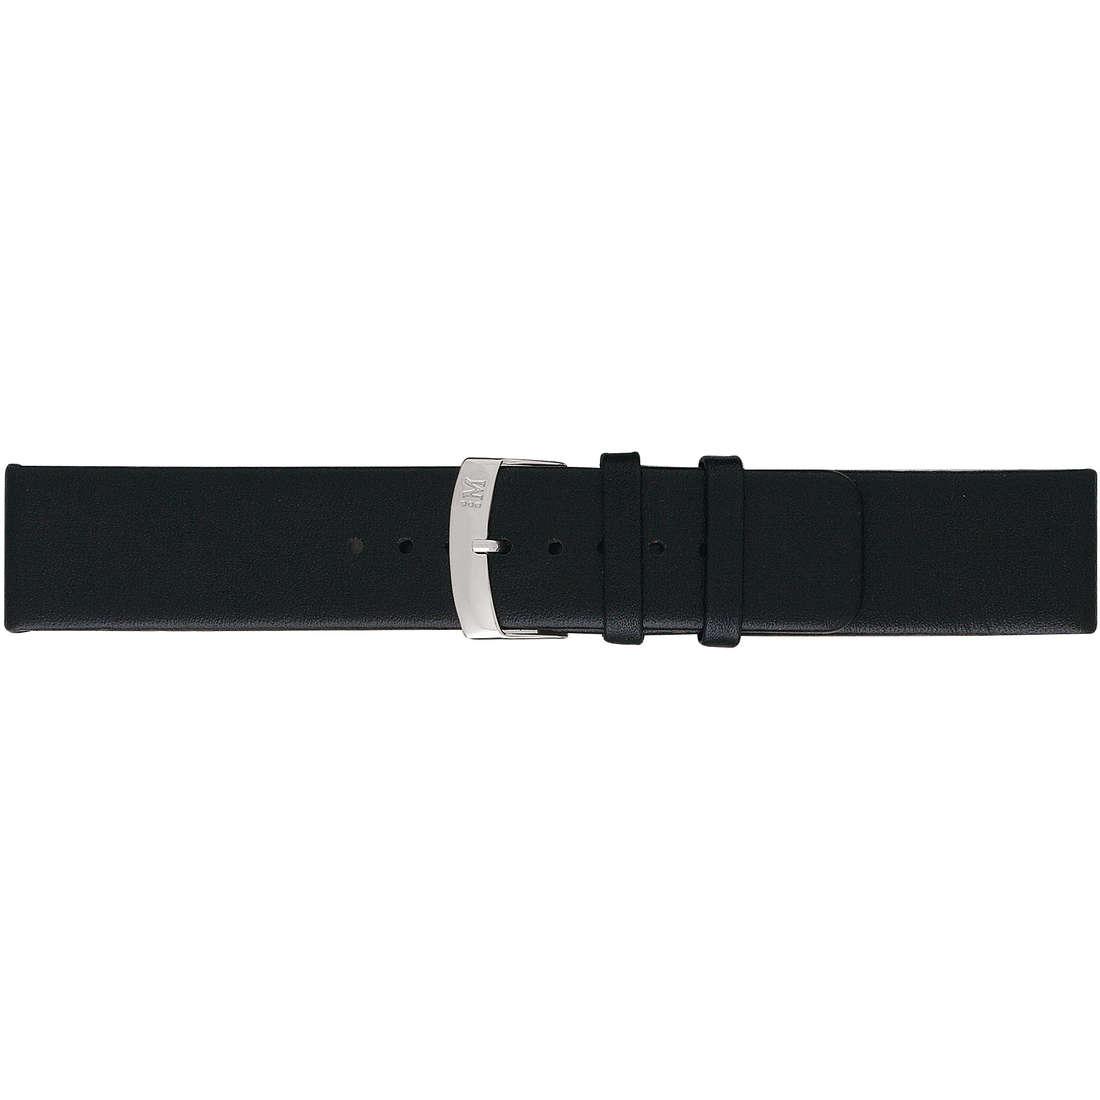 watch watch bands watch straps man Morellato Morellato 1930 A01X3076875019CR26